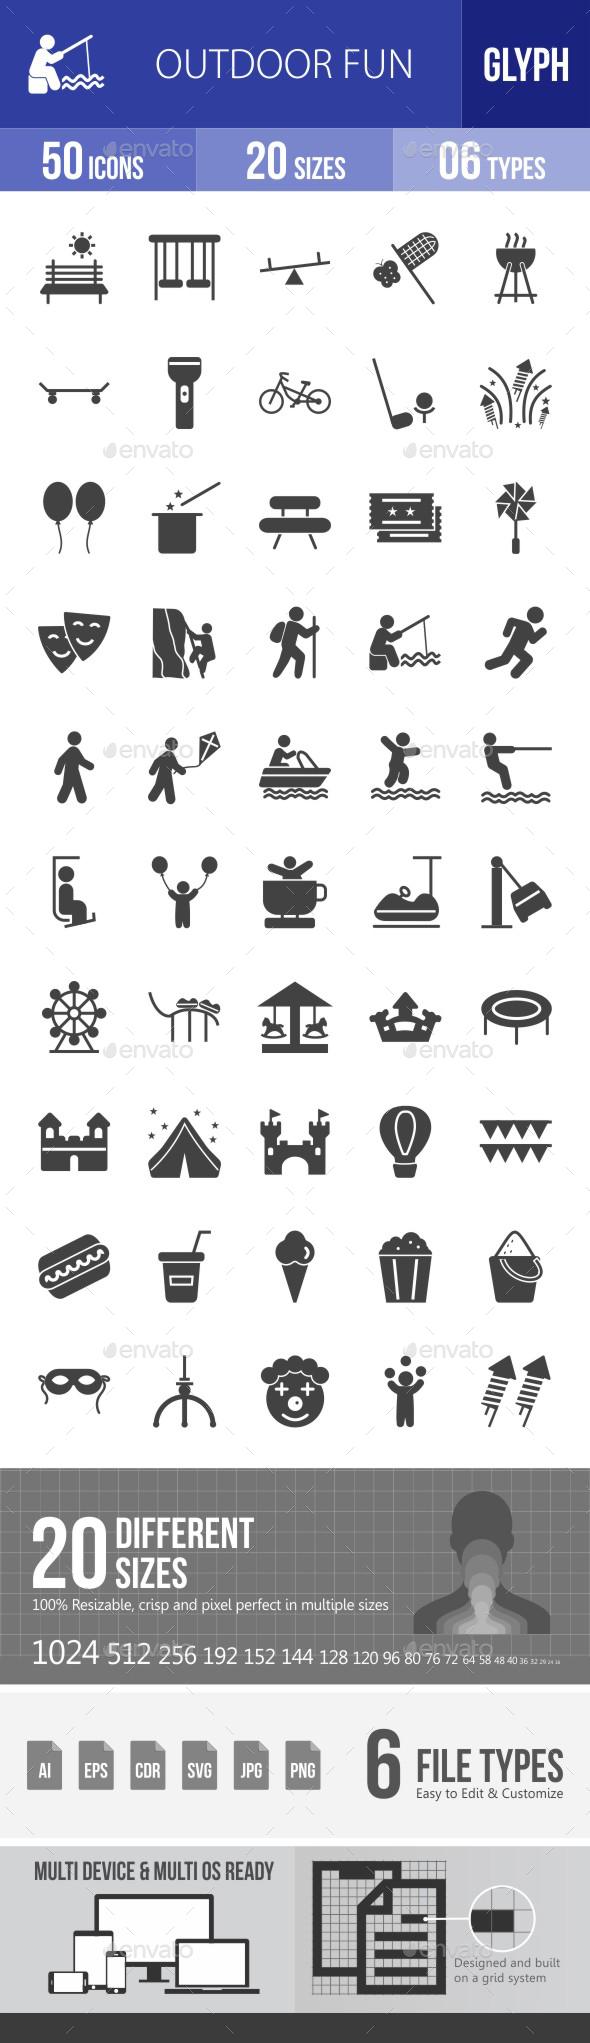 Outdoor Fun Glyph Icons - Icons